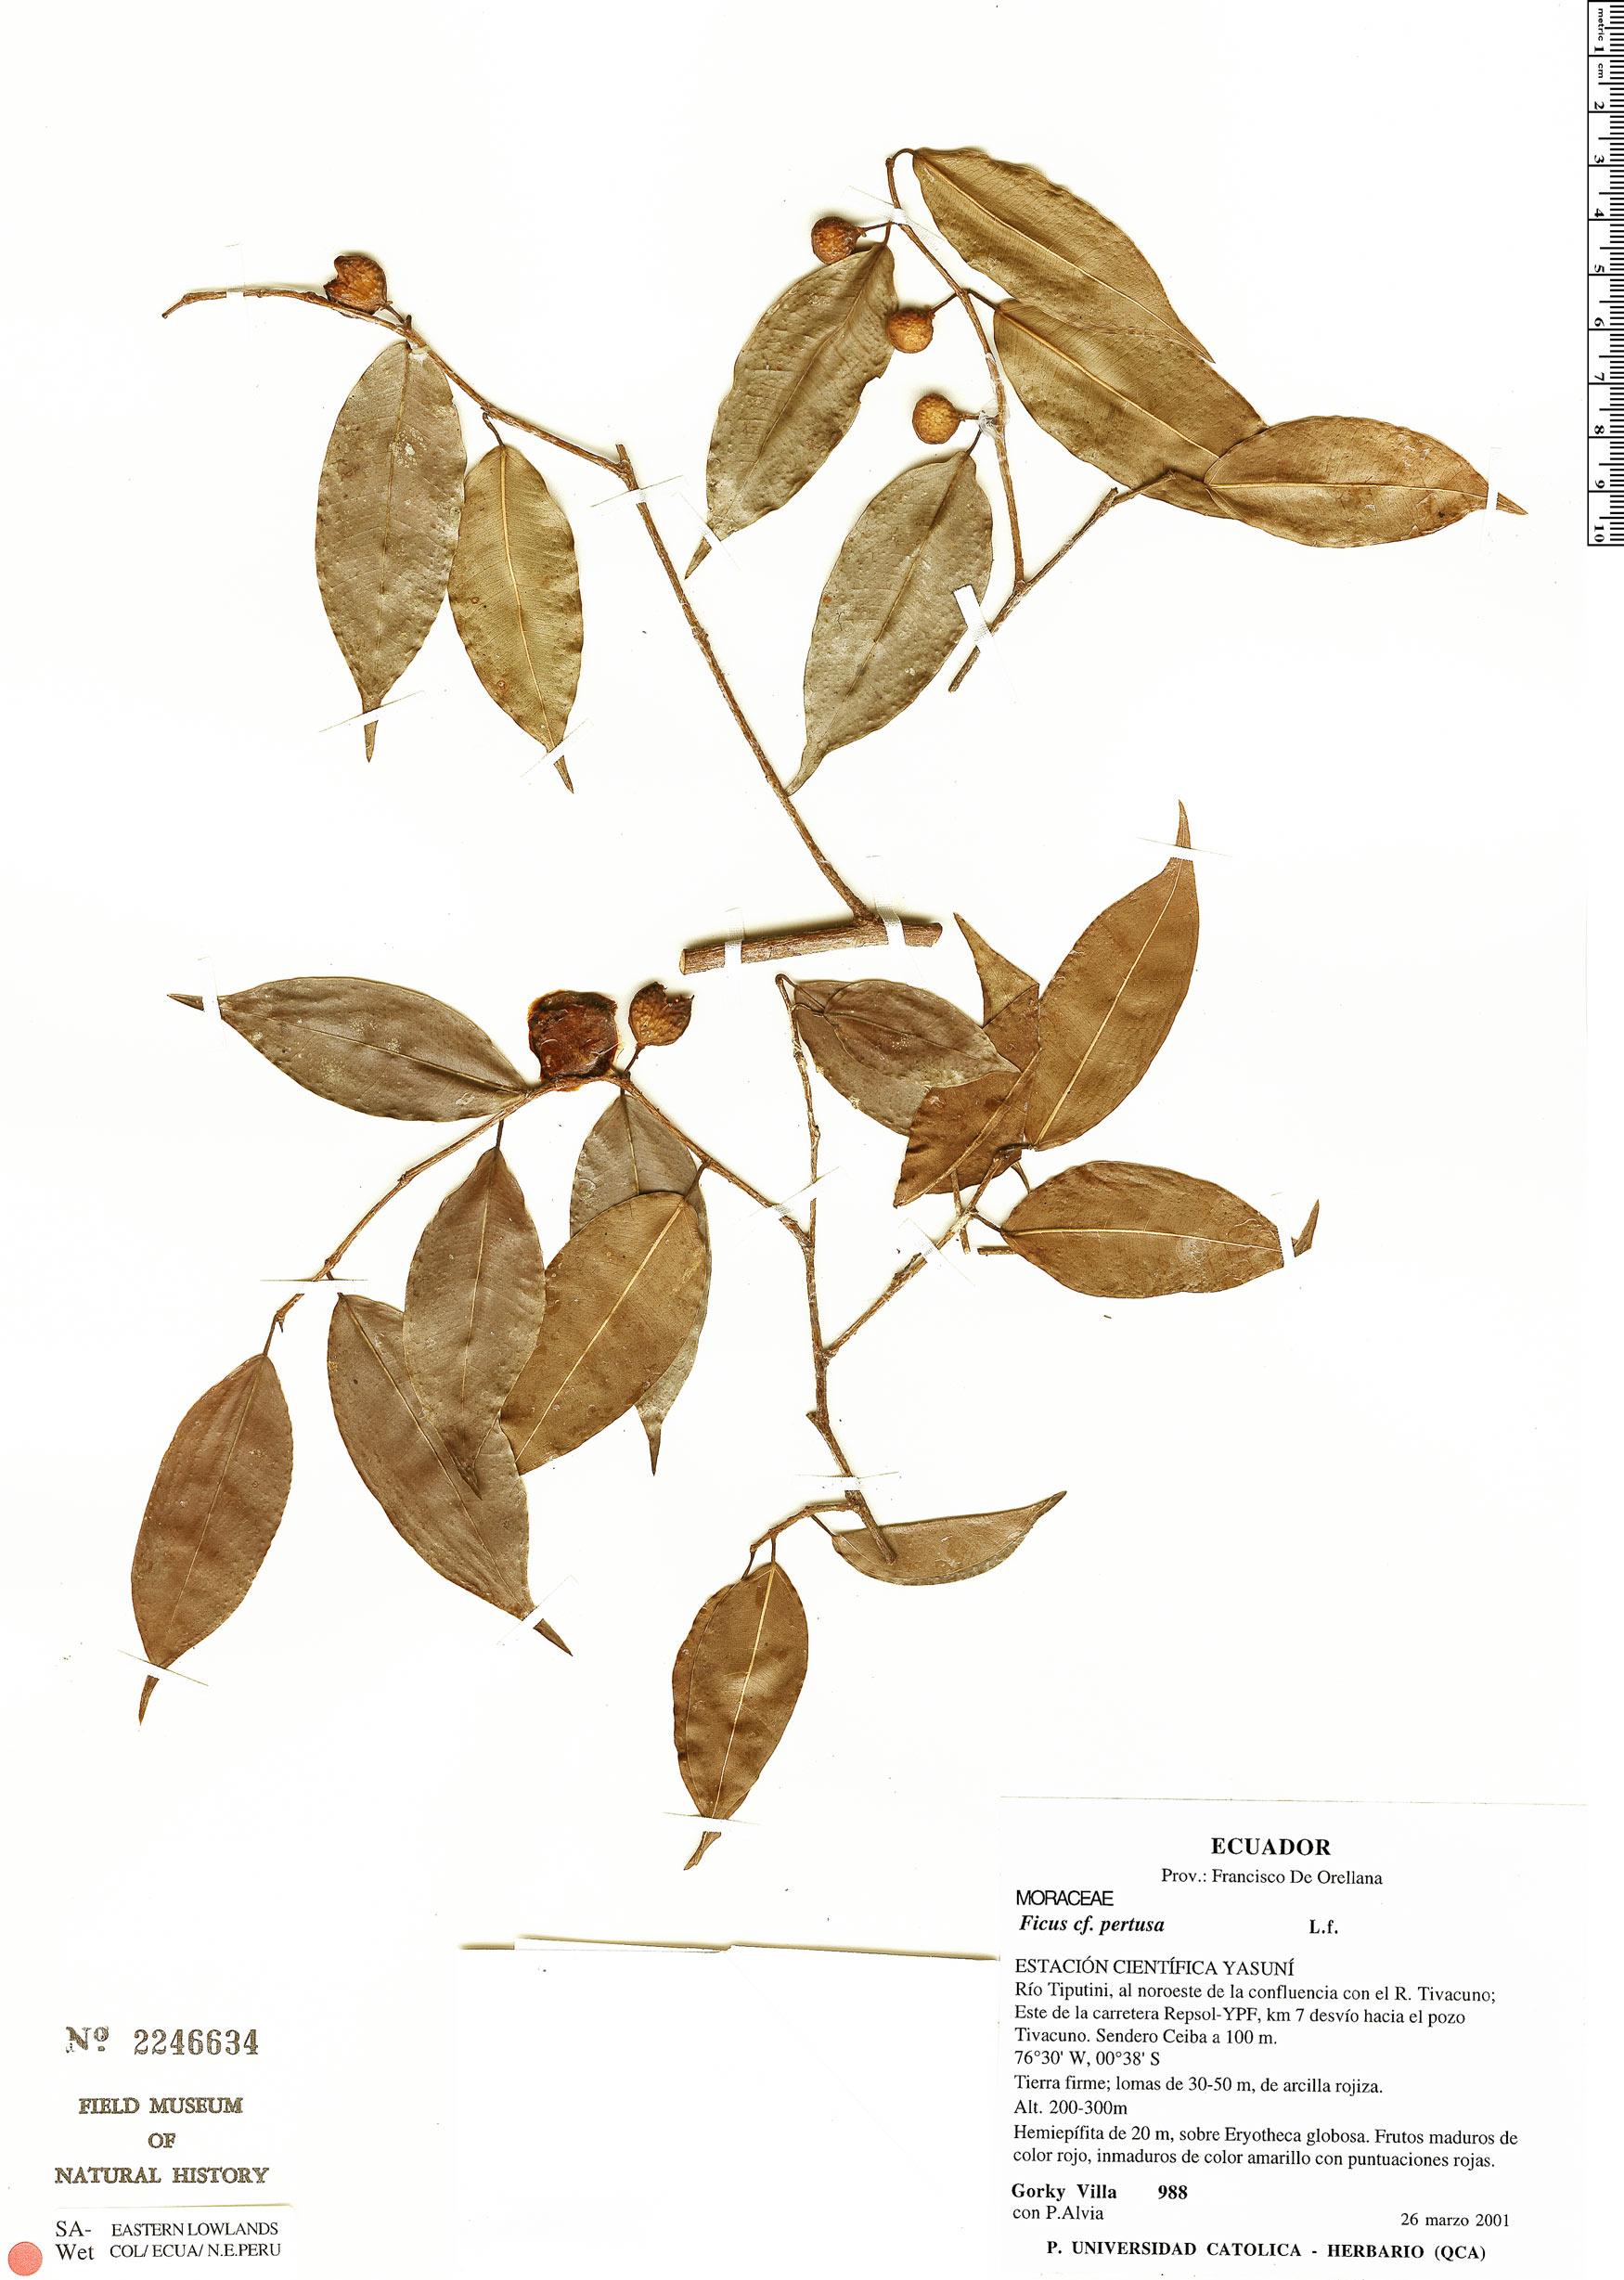 Espécime: Ficus pertusa